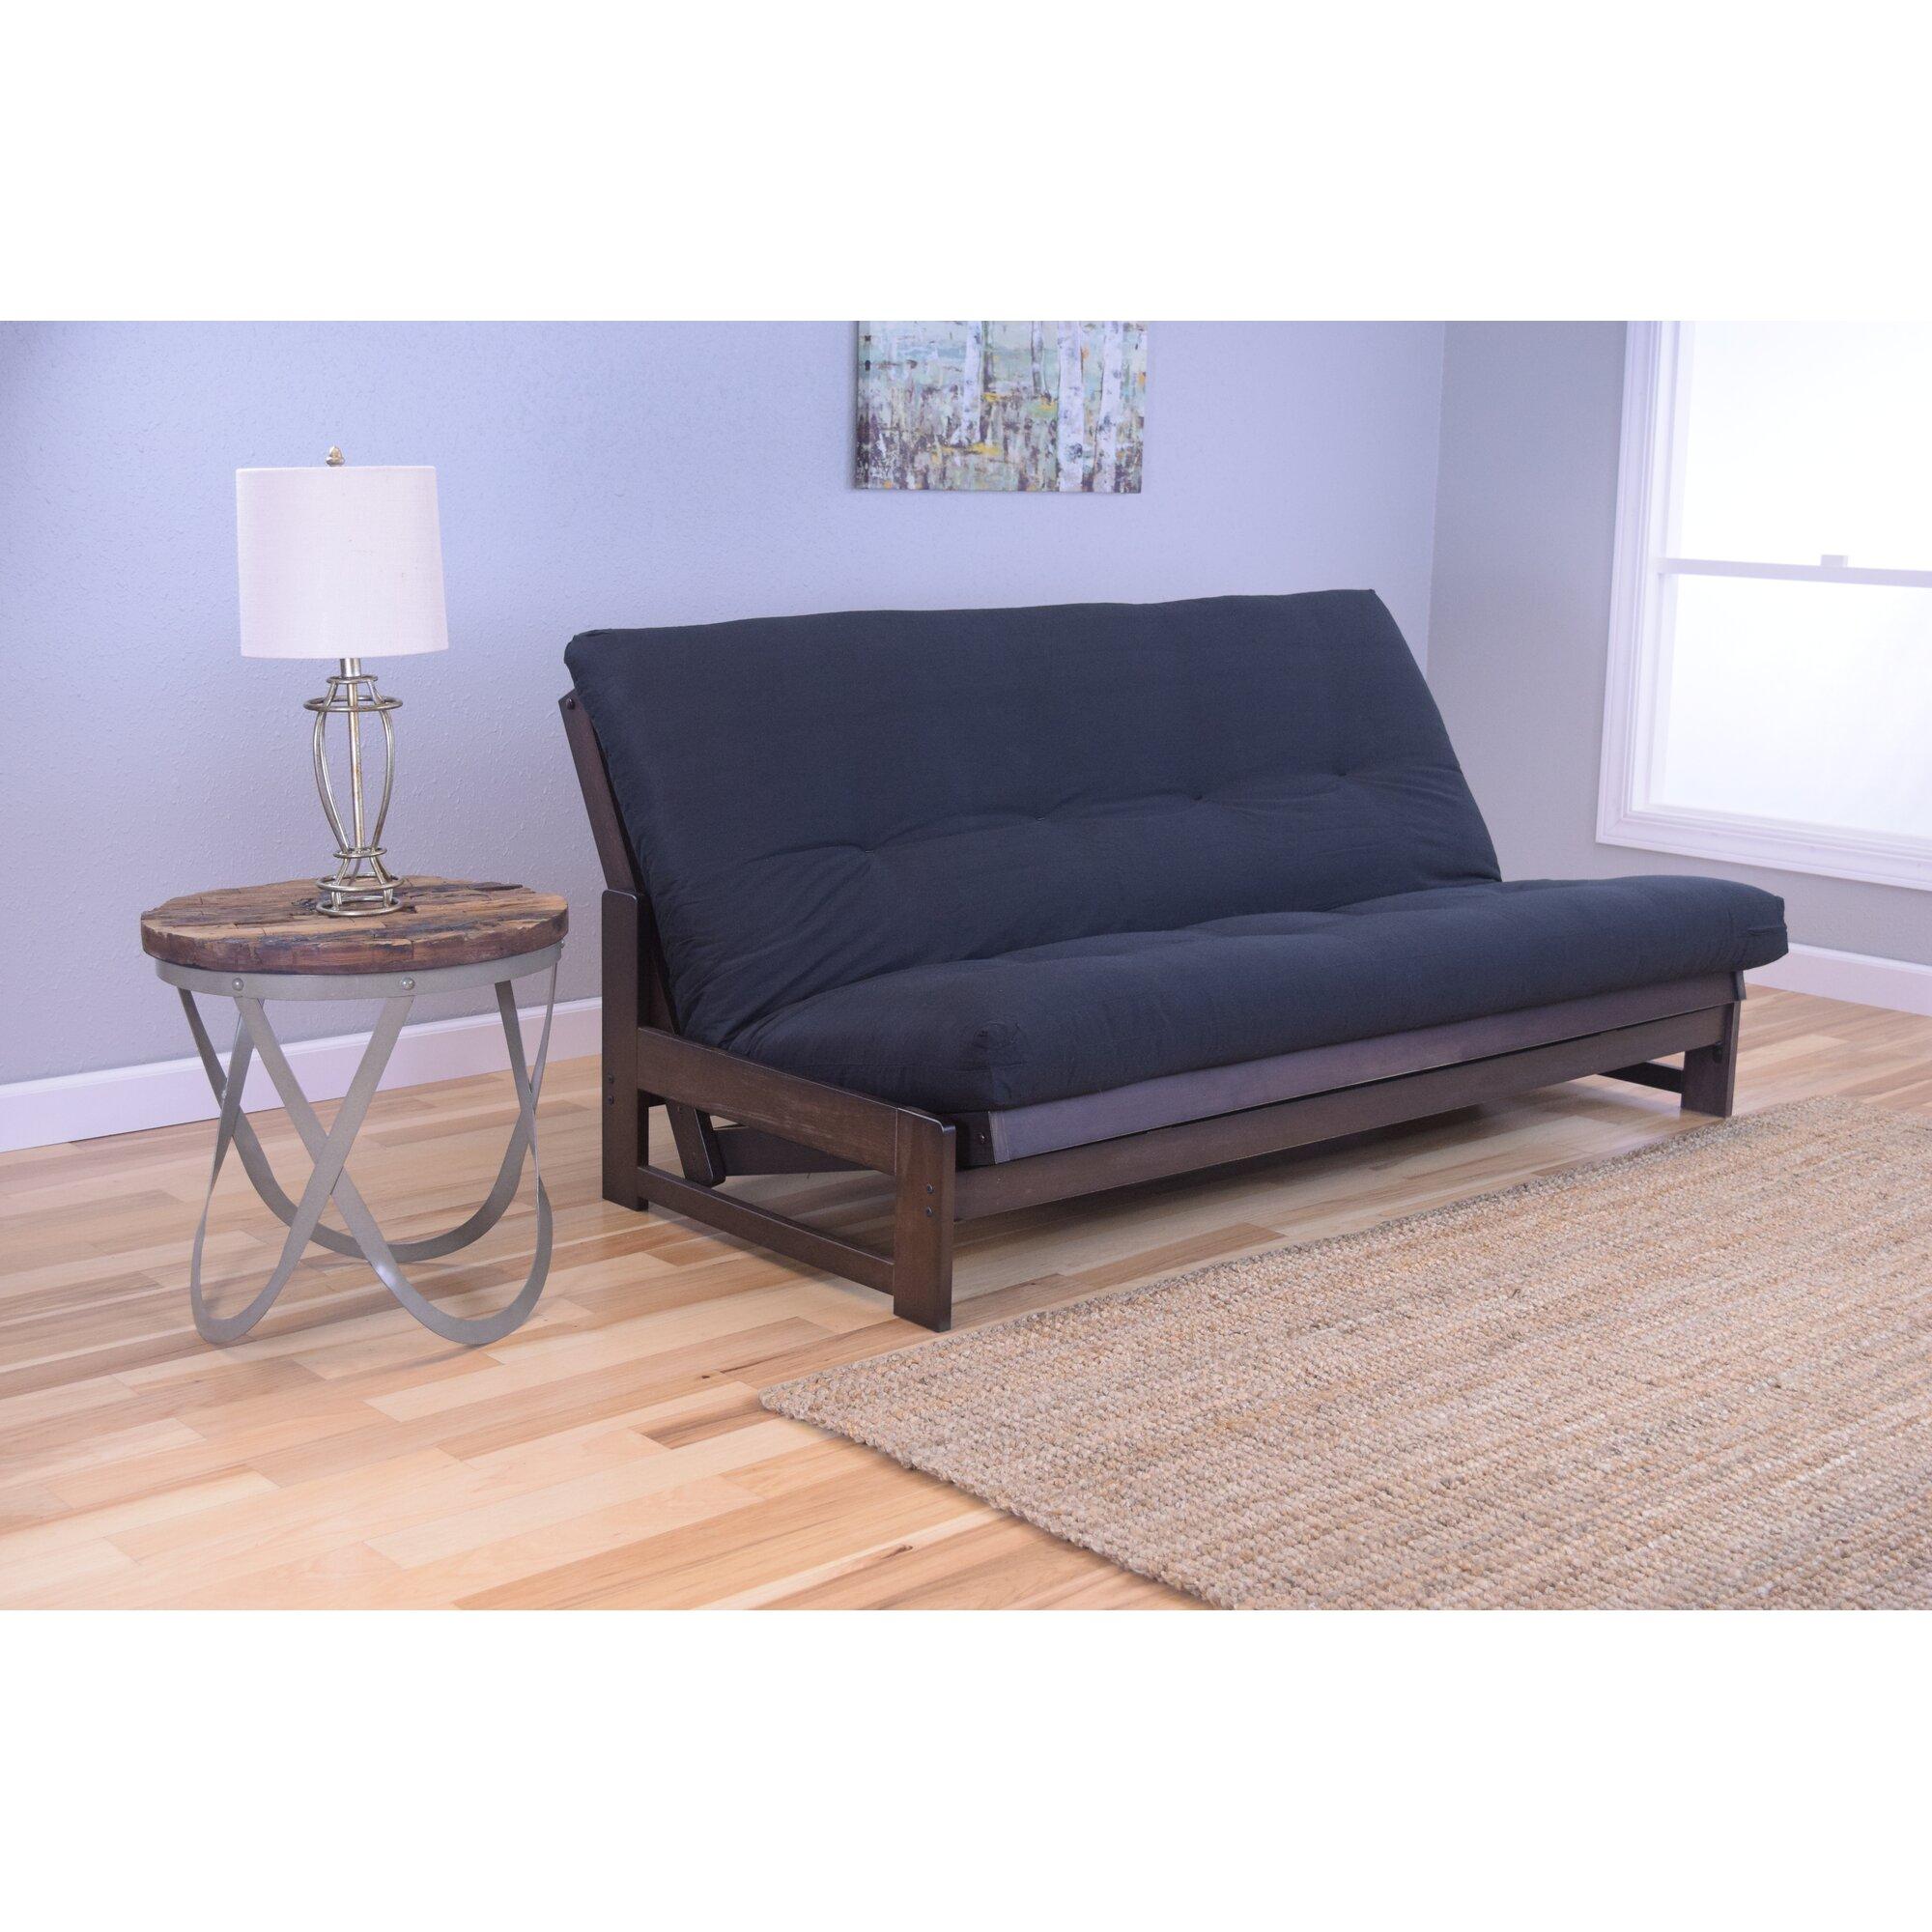 Futon Albany Ny Area Kodiak Furniture Aspen And Mattress Reviews Wayfair